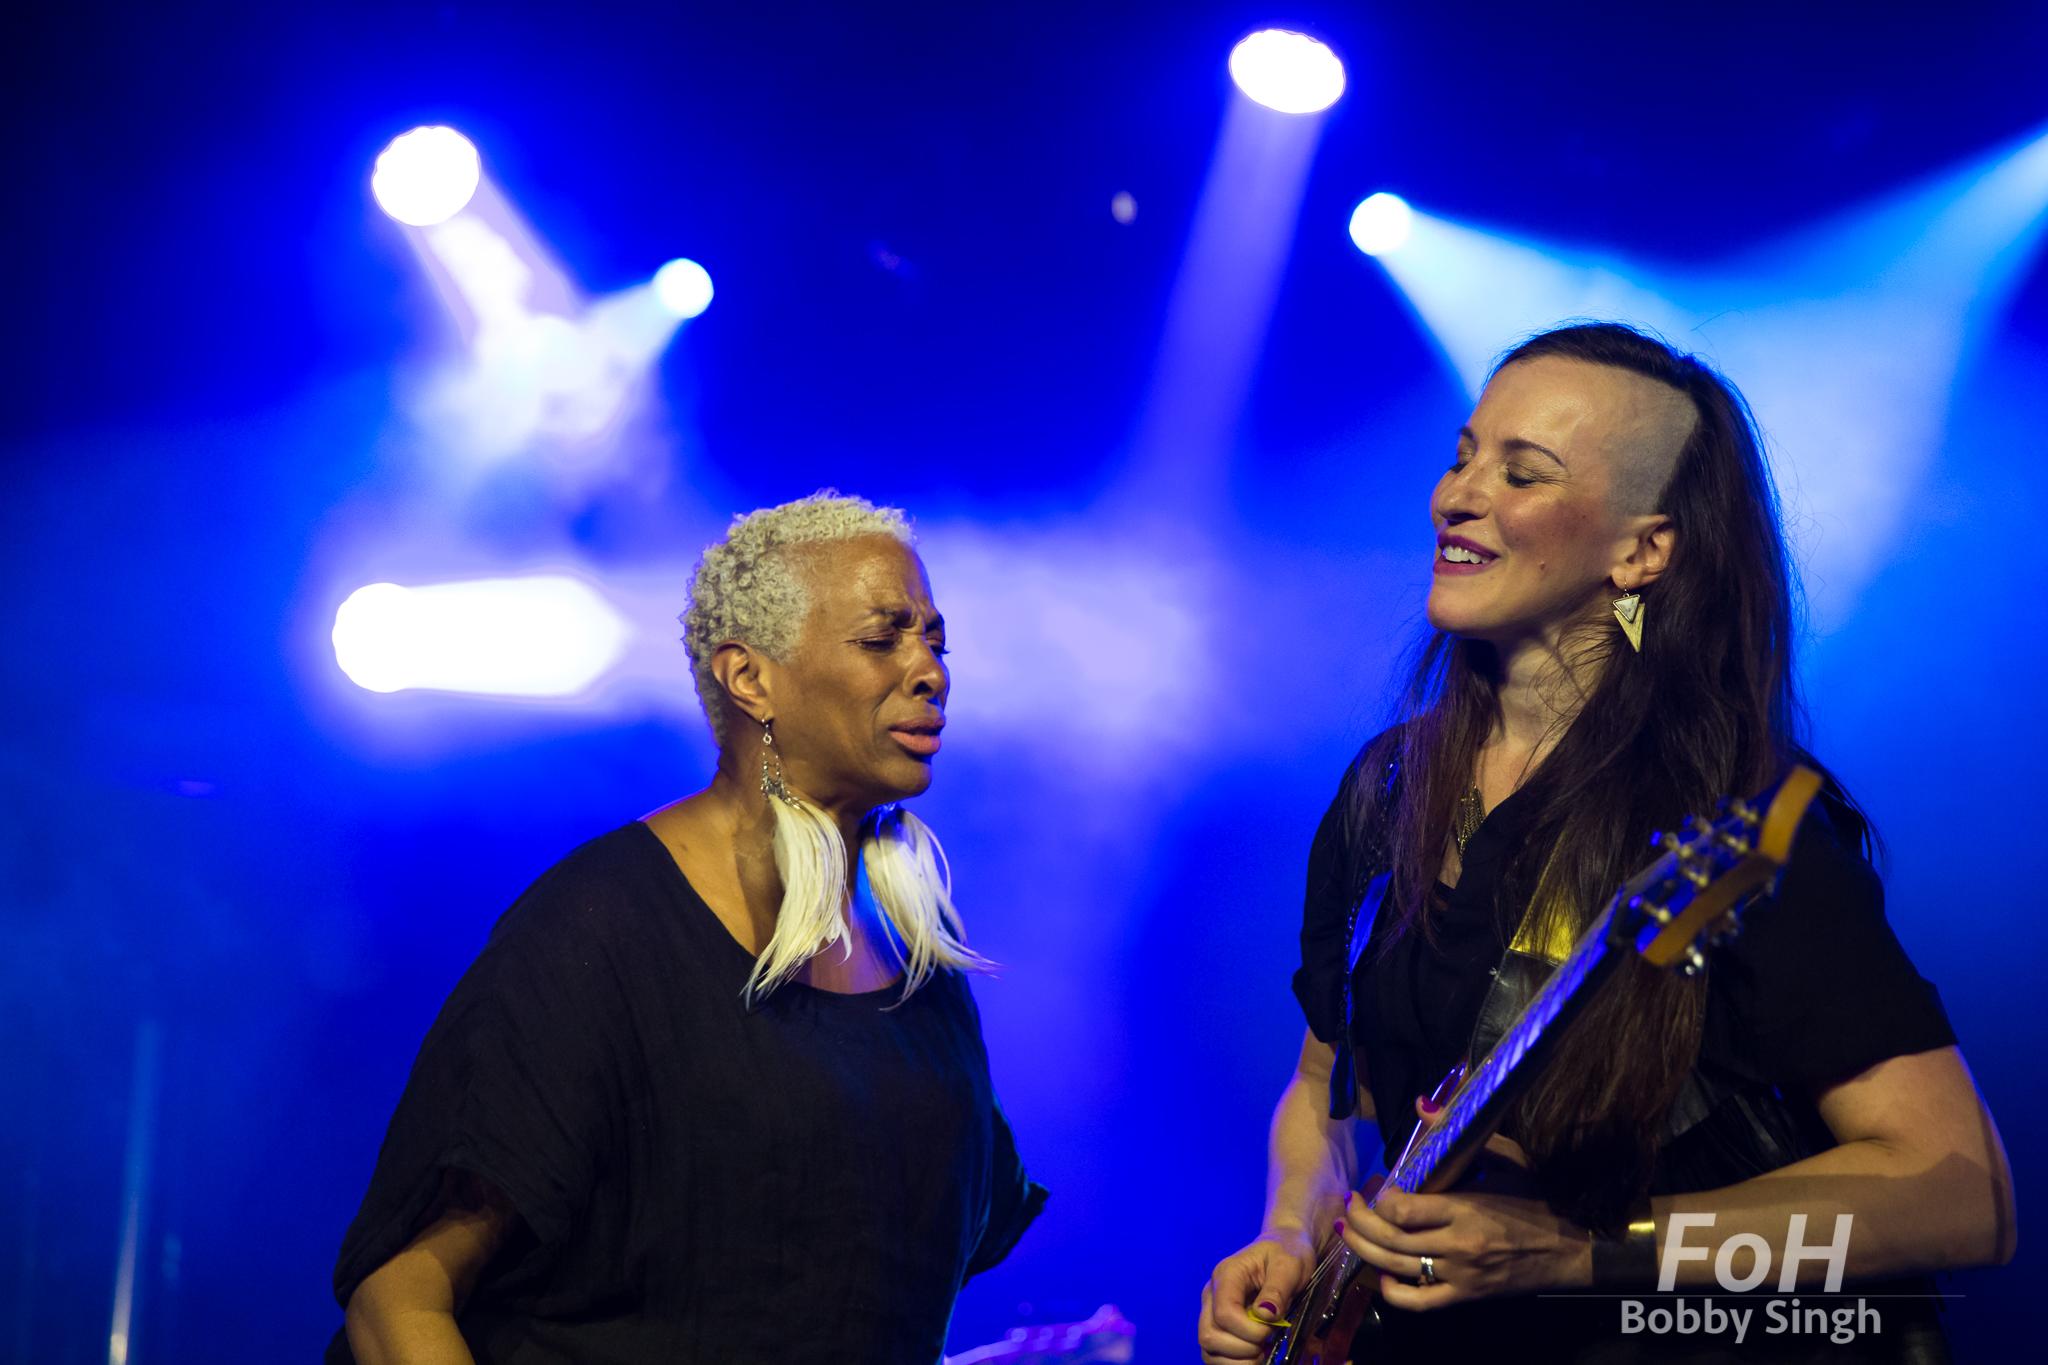 Shakura S'Aida and Donna Grantis